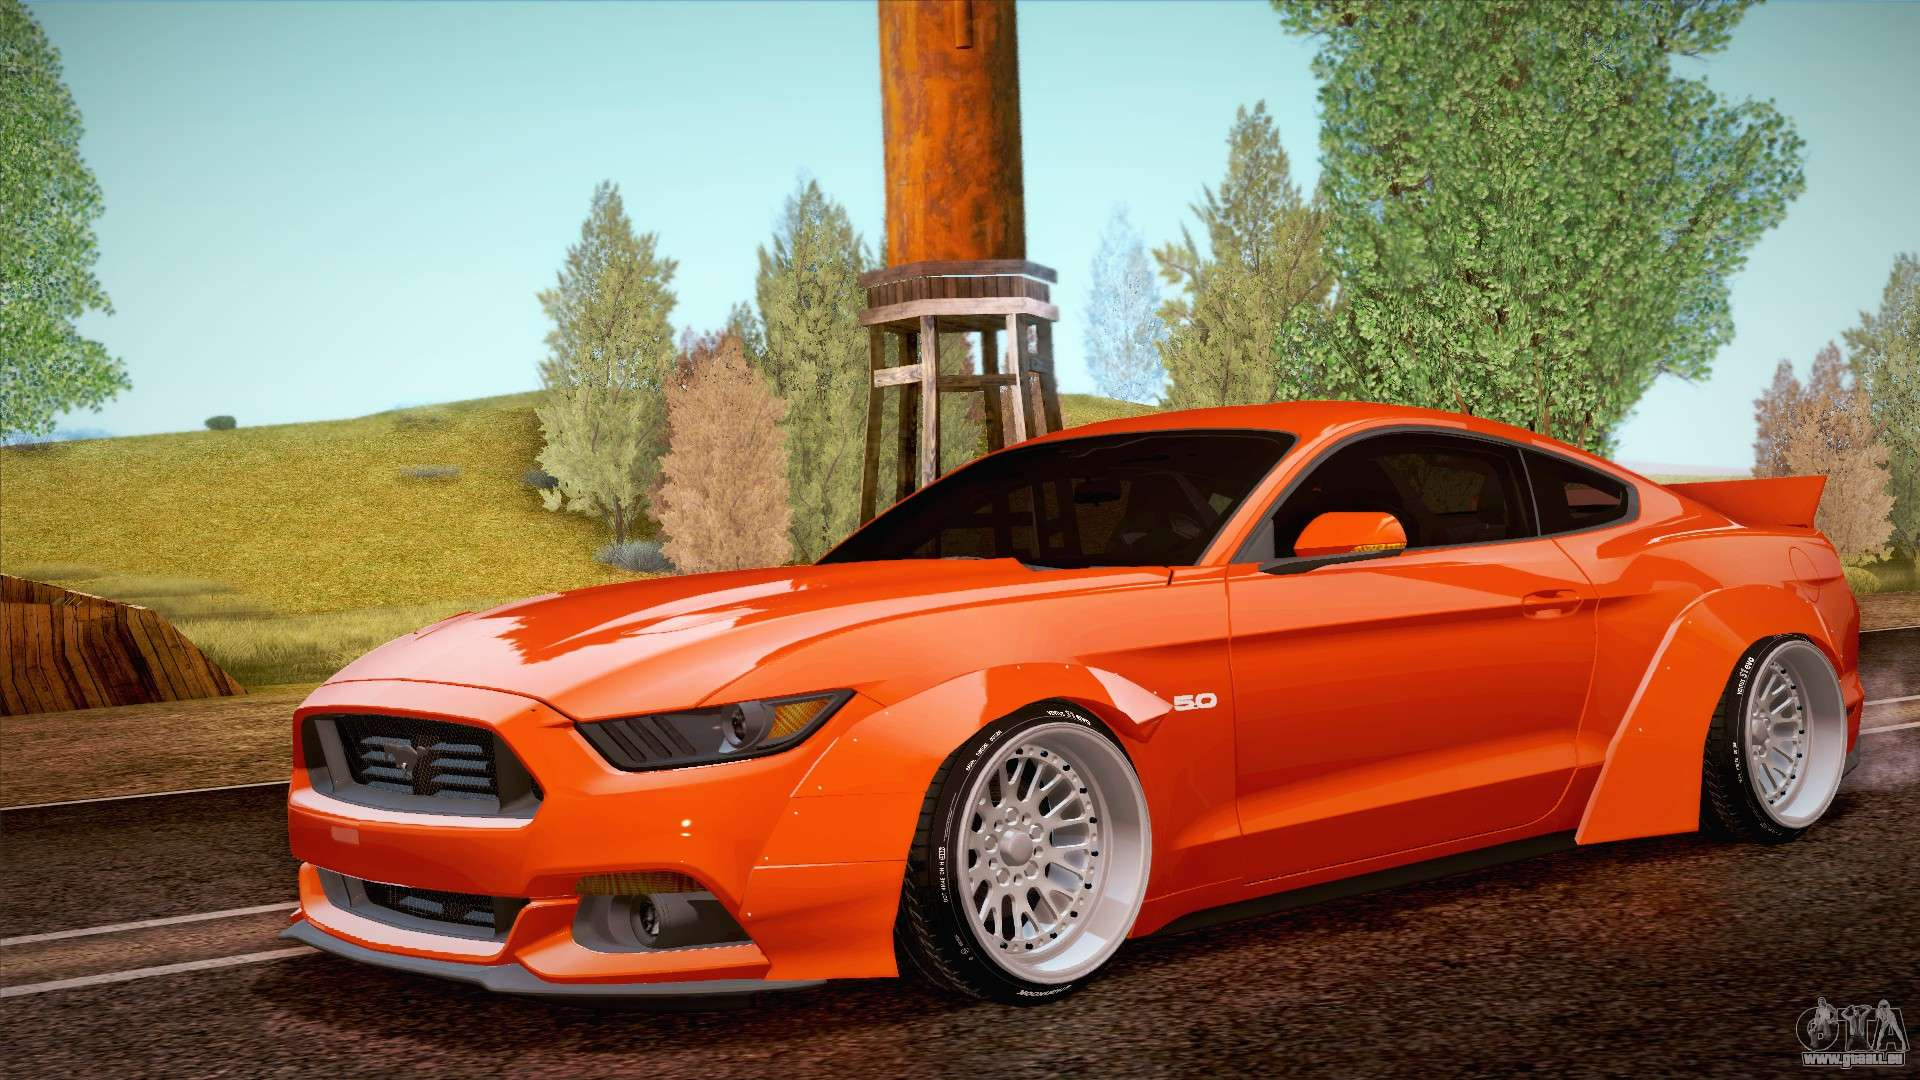 Ford Mustang Rocket Bunny 2015 Pour Gta San Andreas